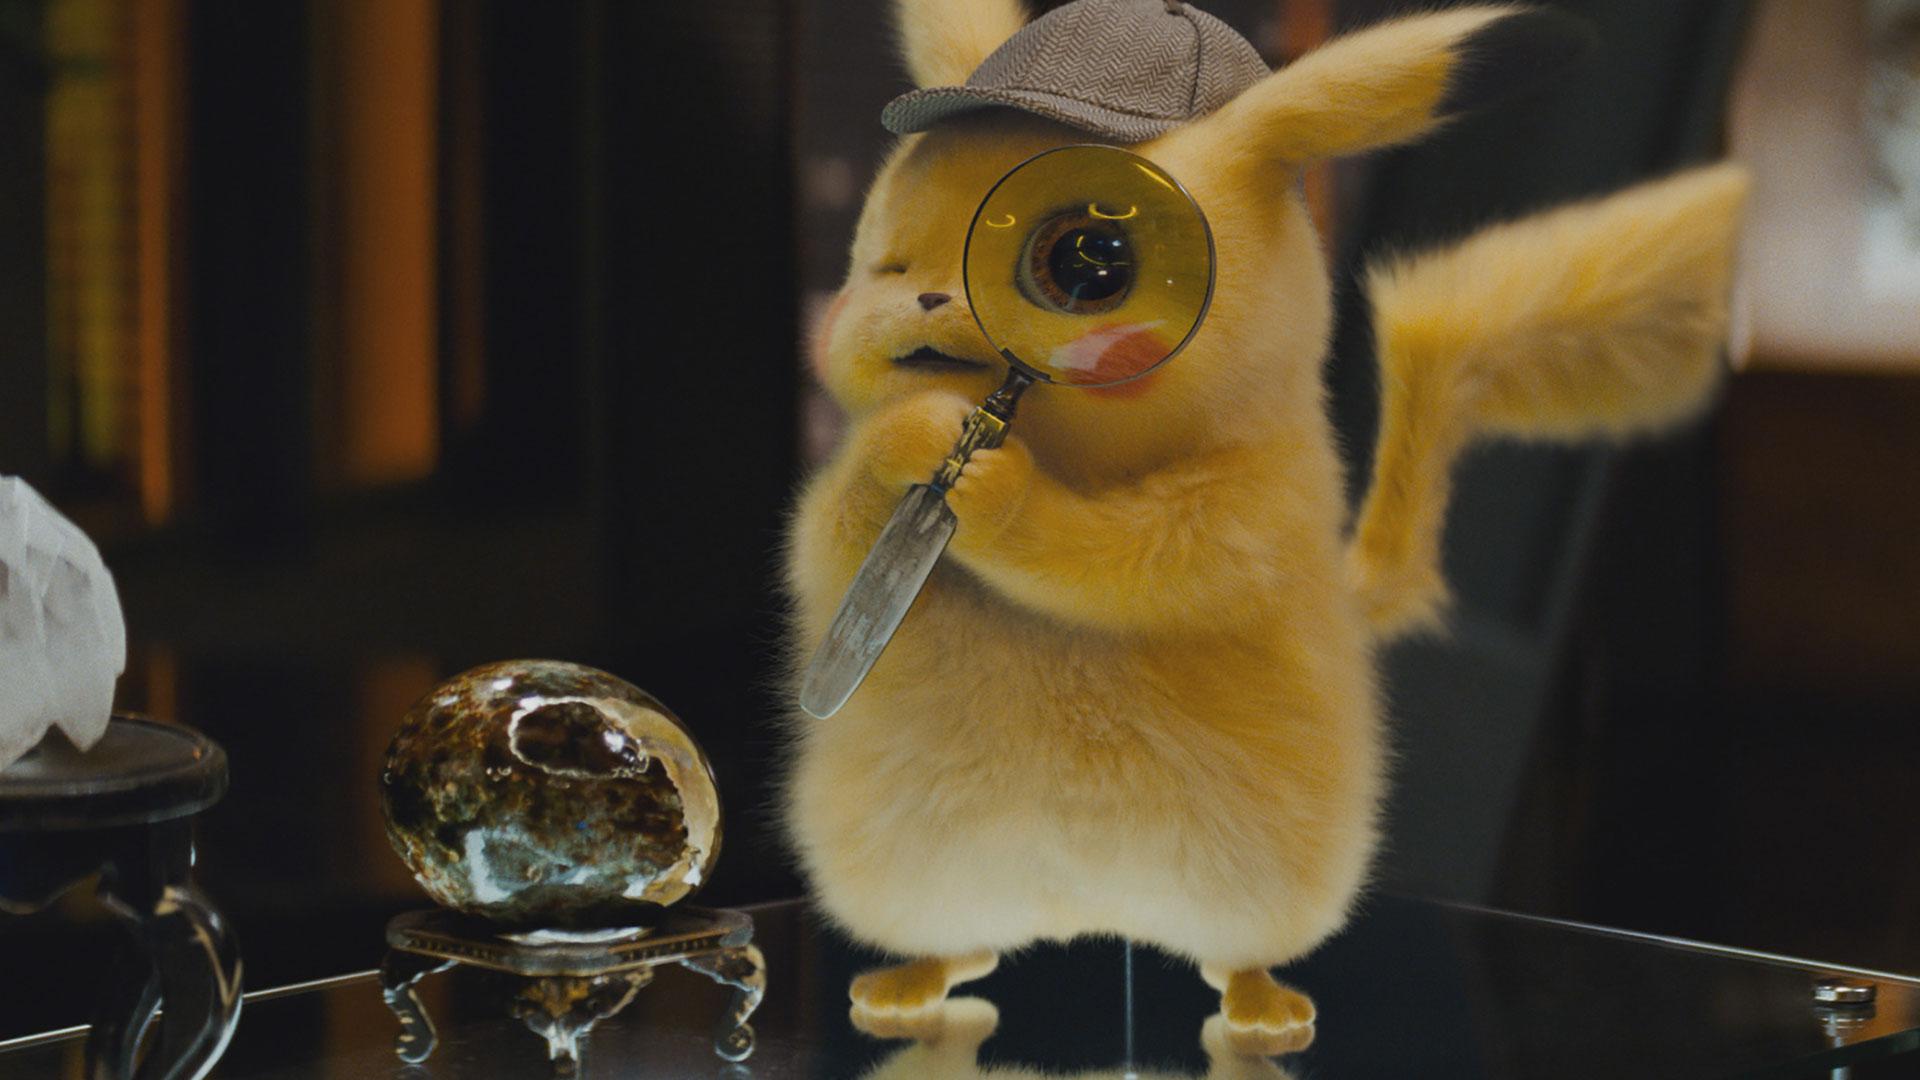 Ryan Reynolds in motion capture as Pikachu in  Pokémon: Detective Pikachu .